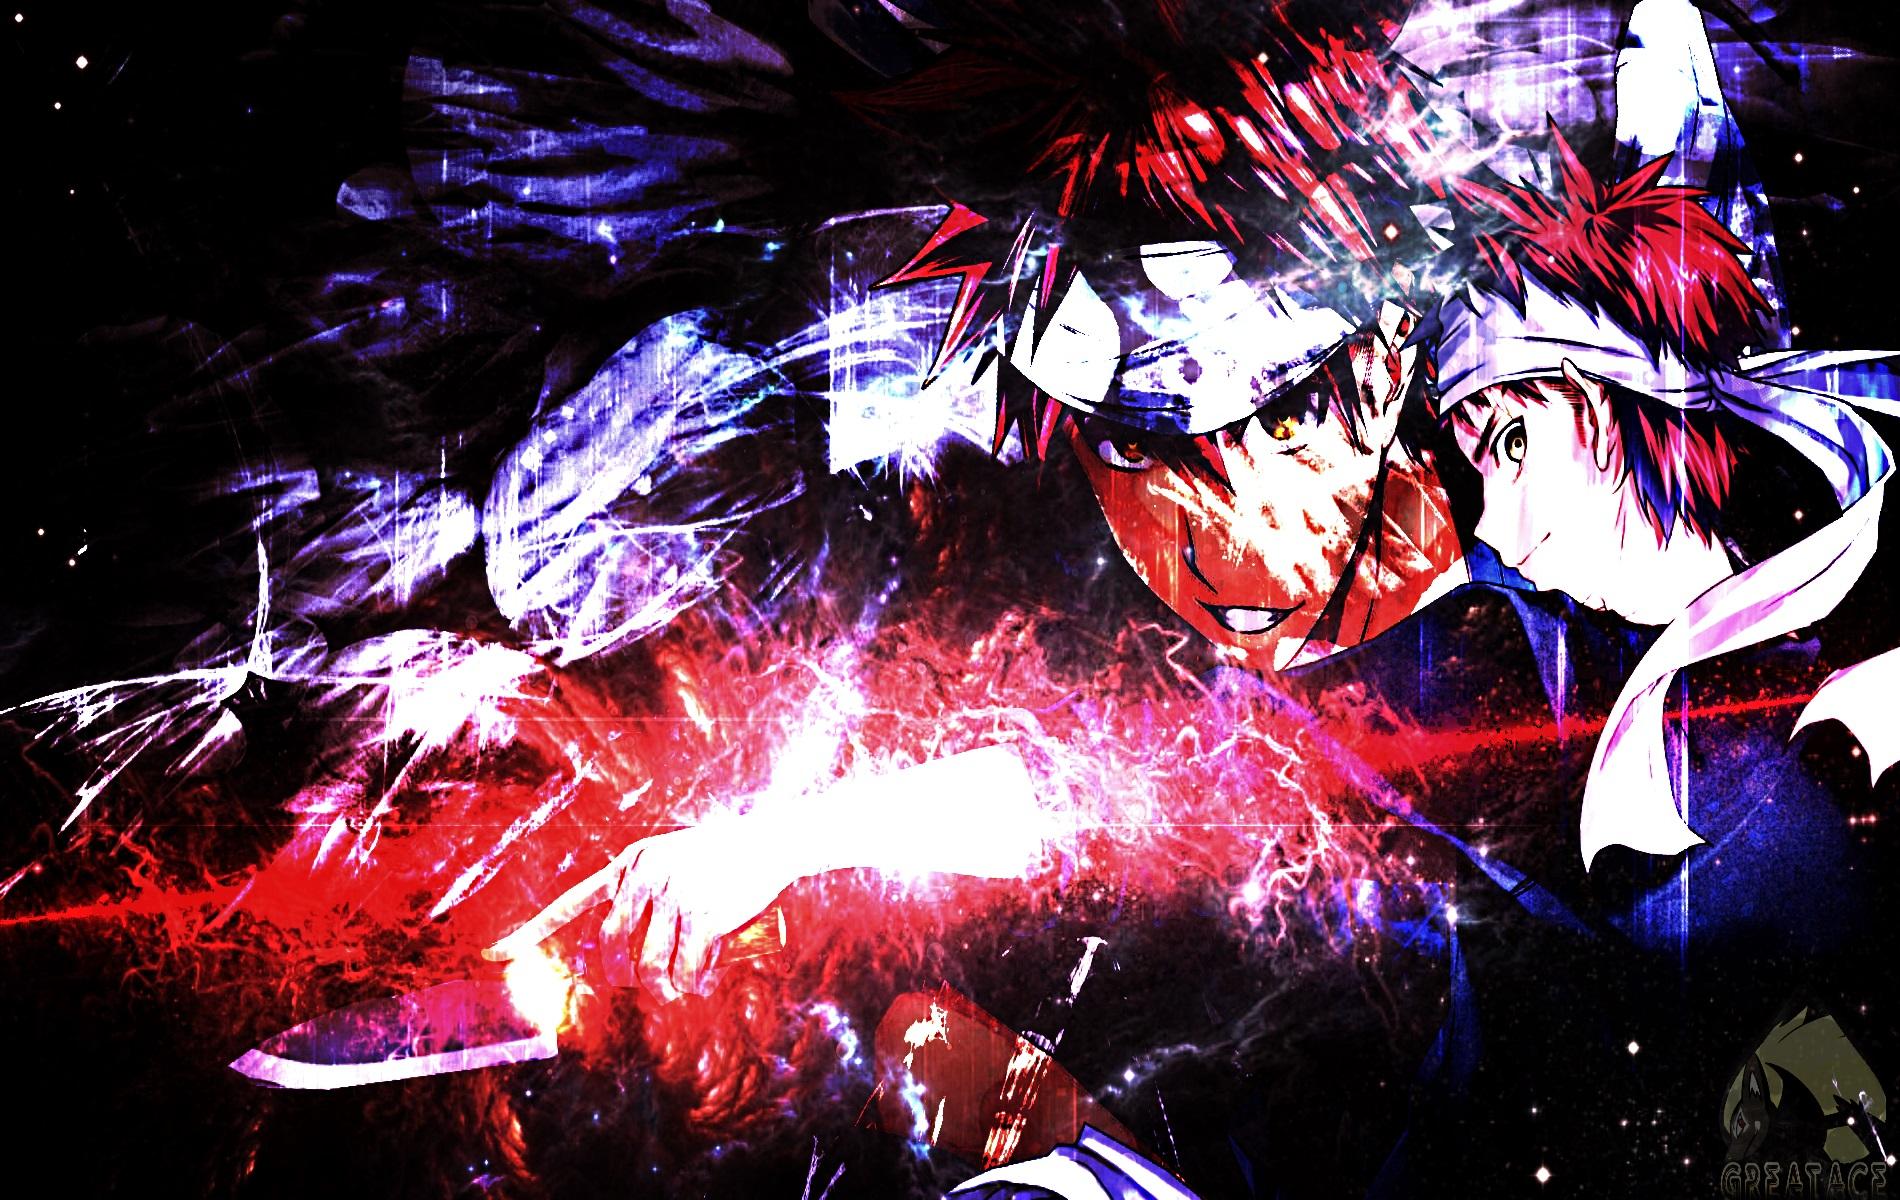 Download 840 Wallpaper Hd Anime Shokugeki No Souma HD Gratid